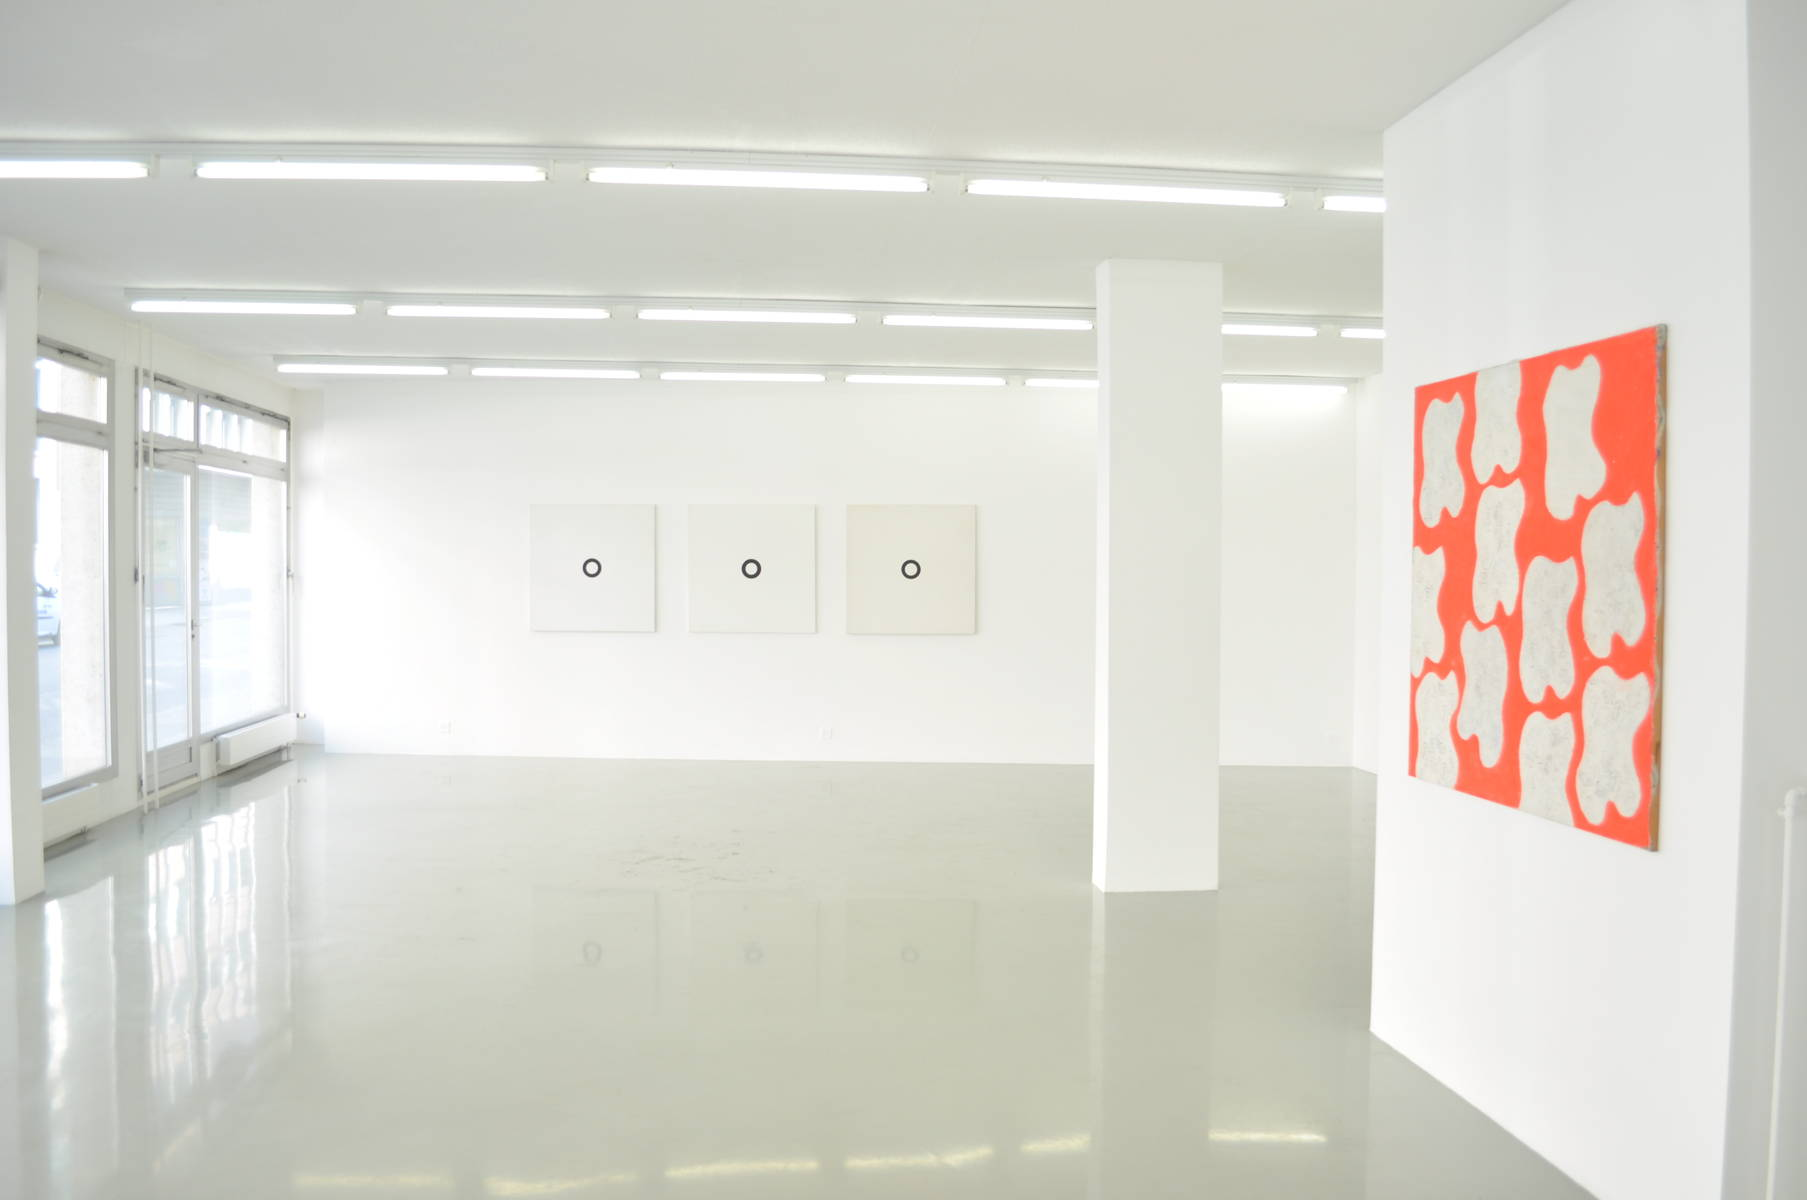 3_Olivier Mosset Claud 2012 geneve 110